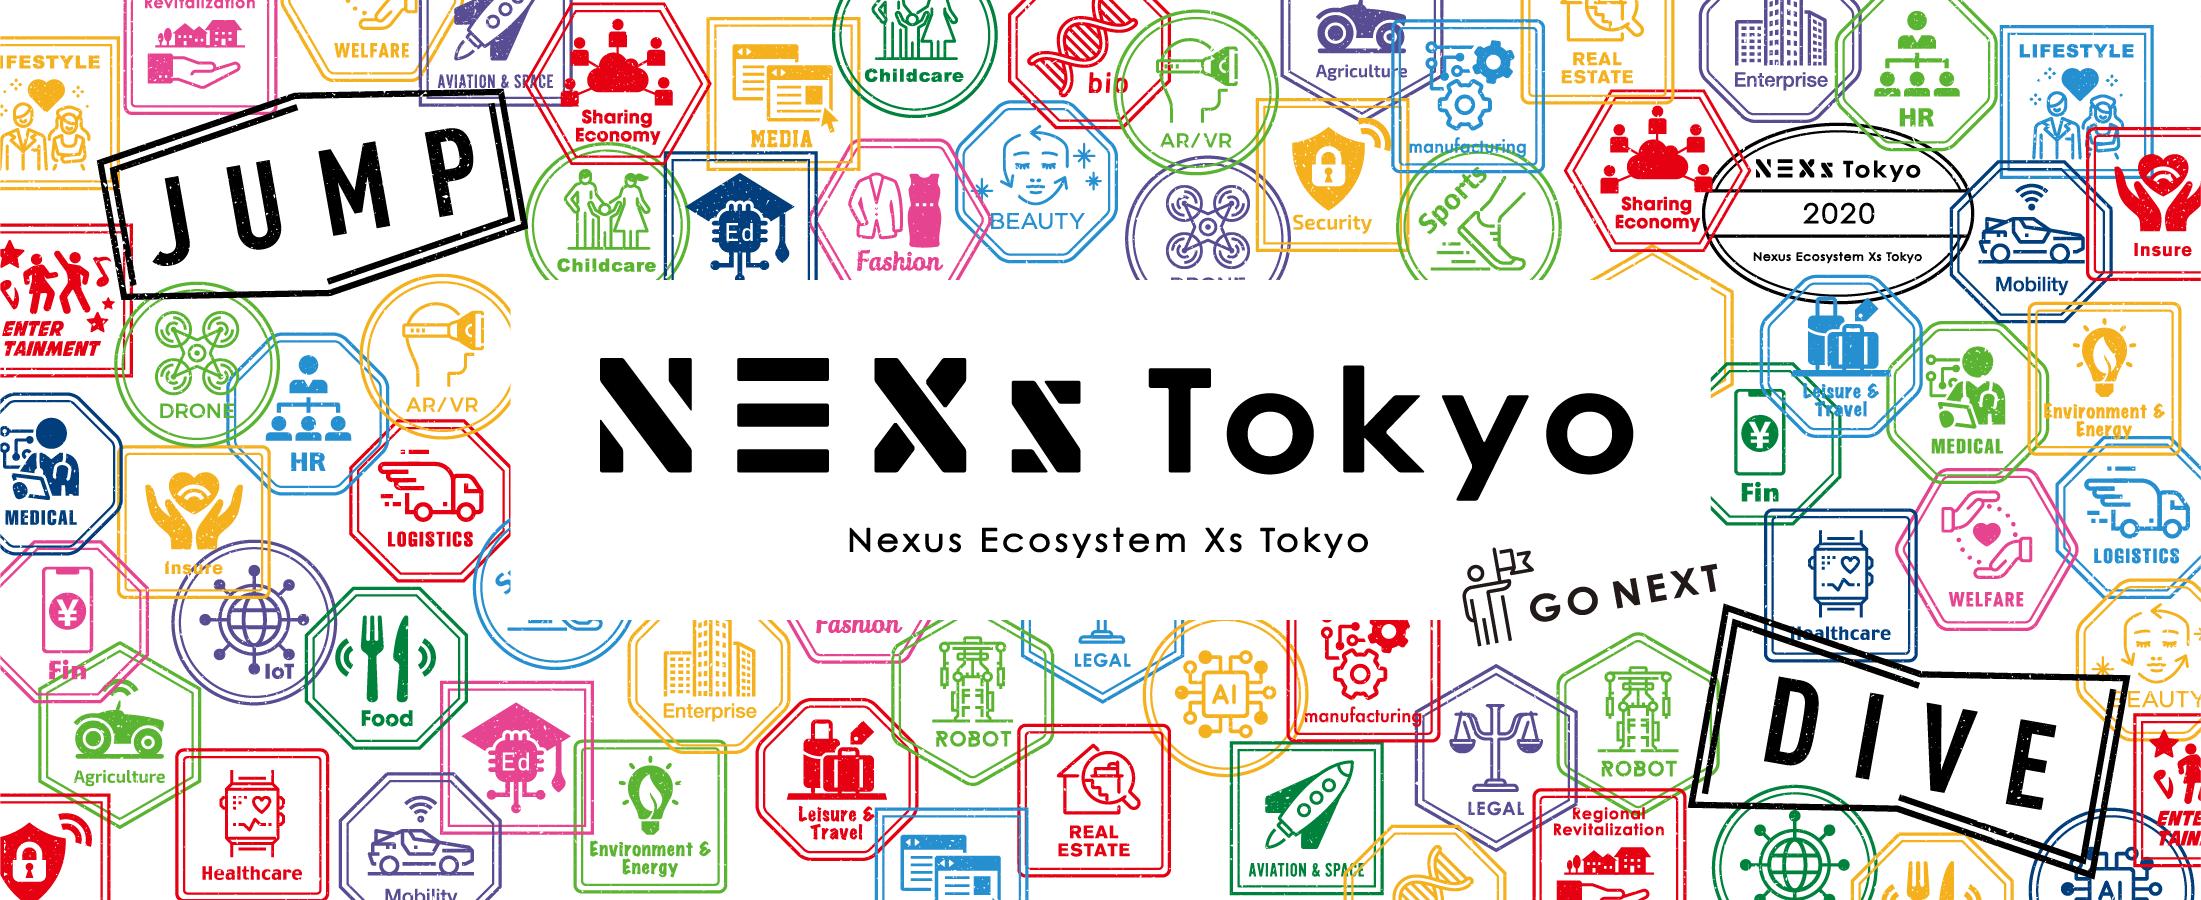 NEXs Tokyo nexus Ecosystem Xs Tokyo